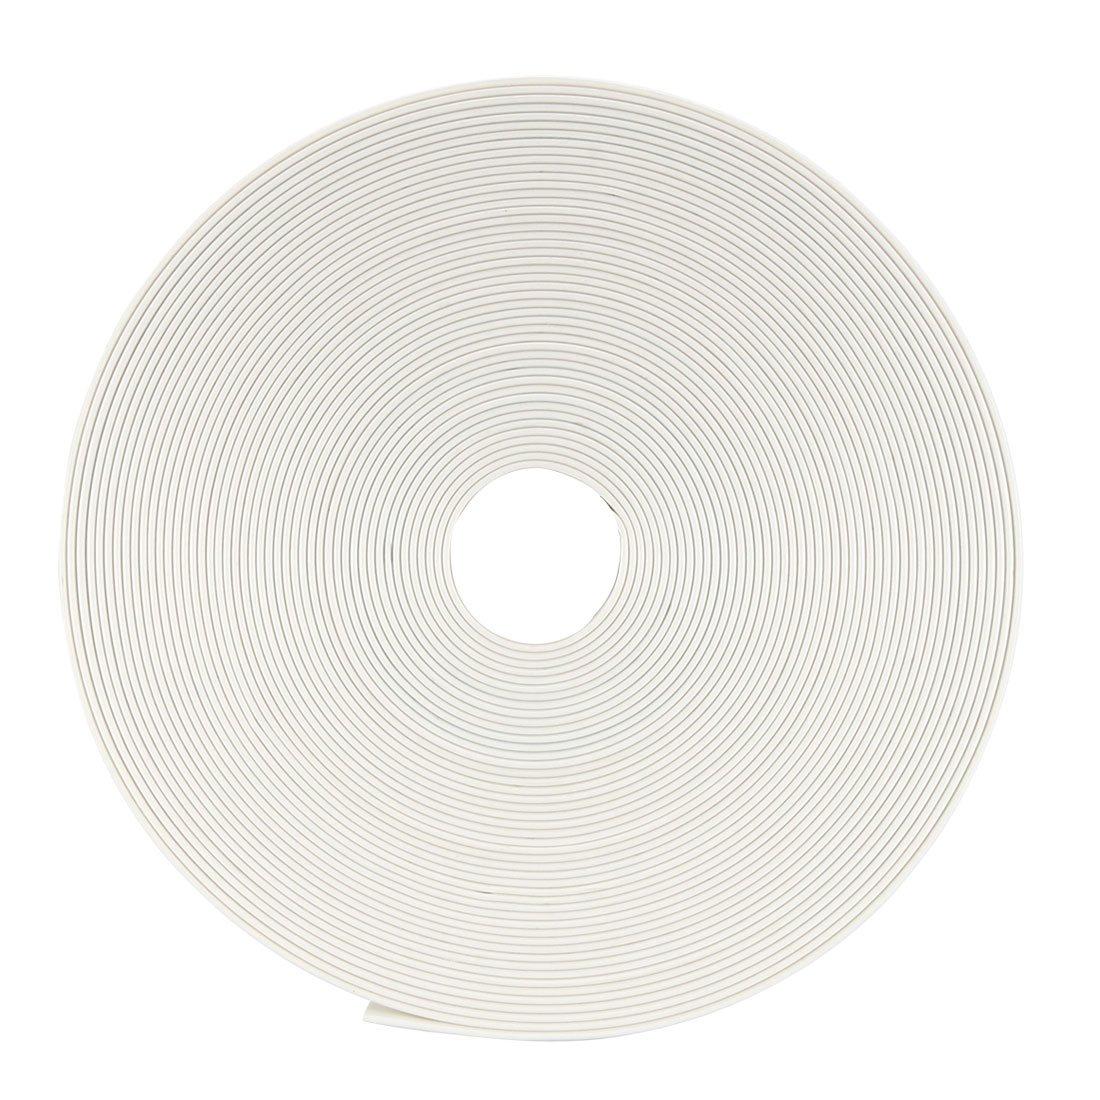 Sourcingmap Tubo termorretr/áctil 2:1 Tubo de aislamiento el/éctrico Cable Tubo Envoltorio Blanco 10 mm Di/ámetro 10 m Longitud